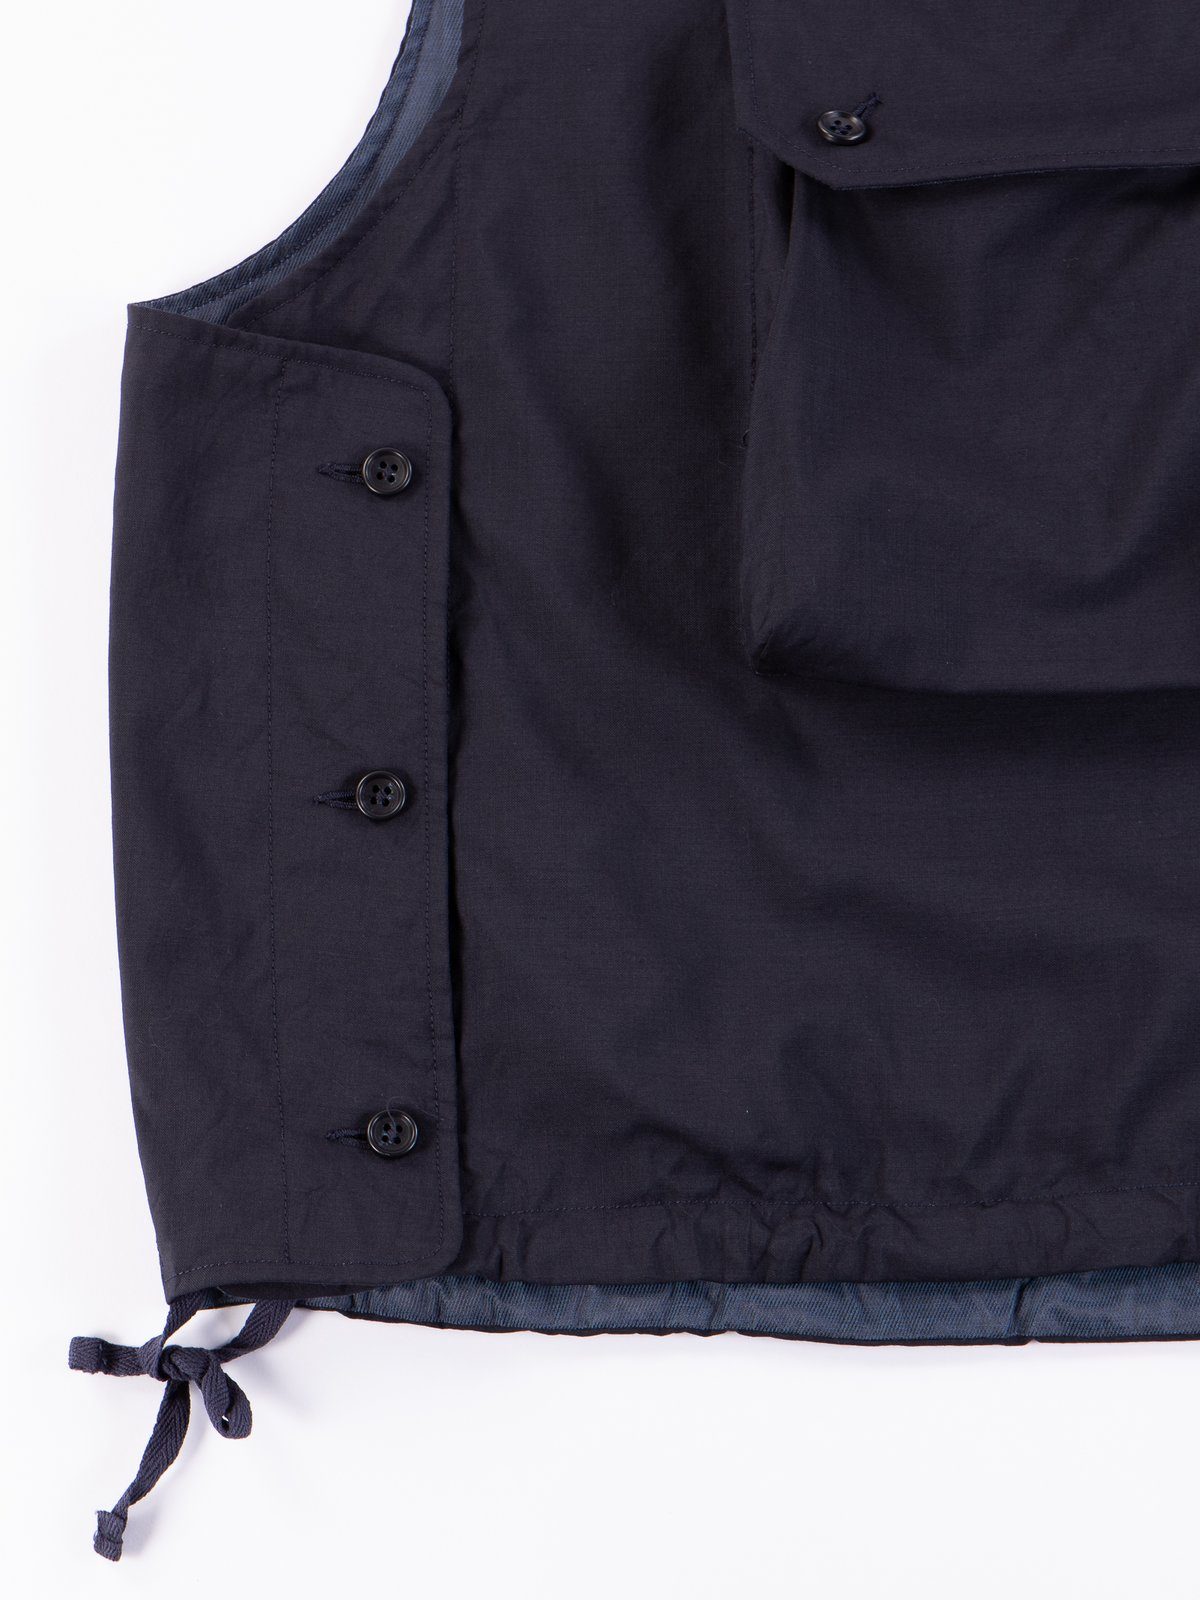 Dark Navy Tropical Wool Cover Vest - Image 4